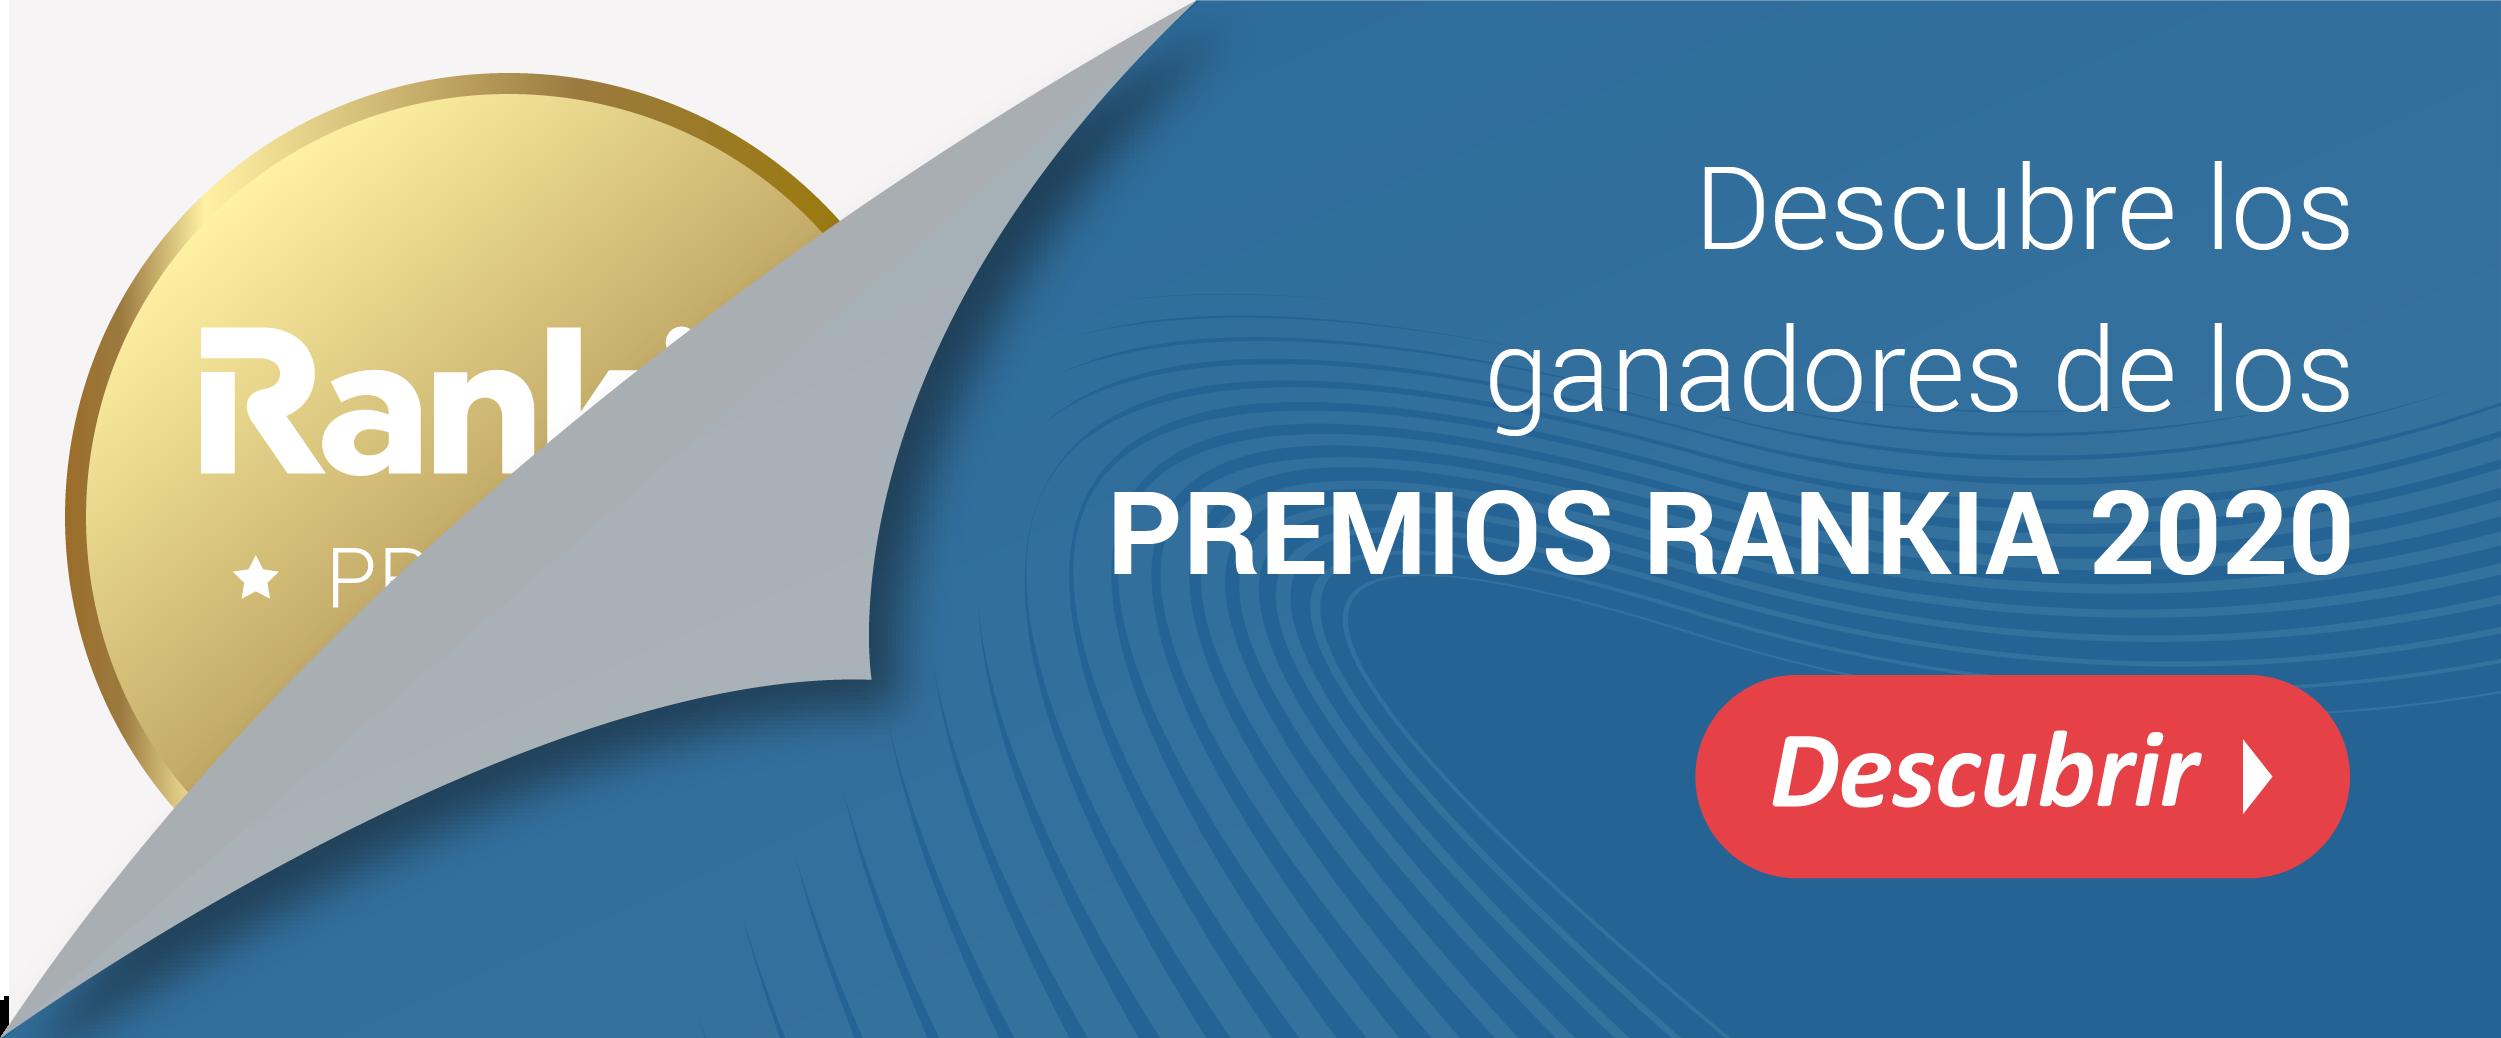 premios rankia 2020 chile